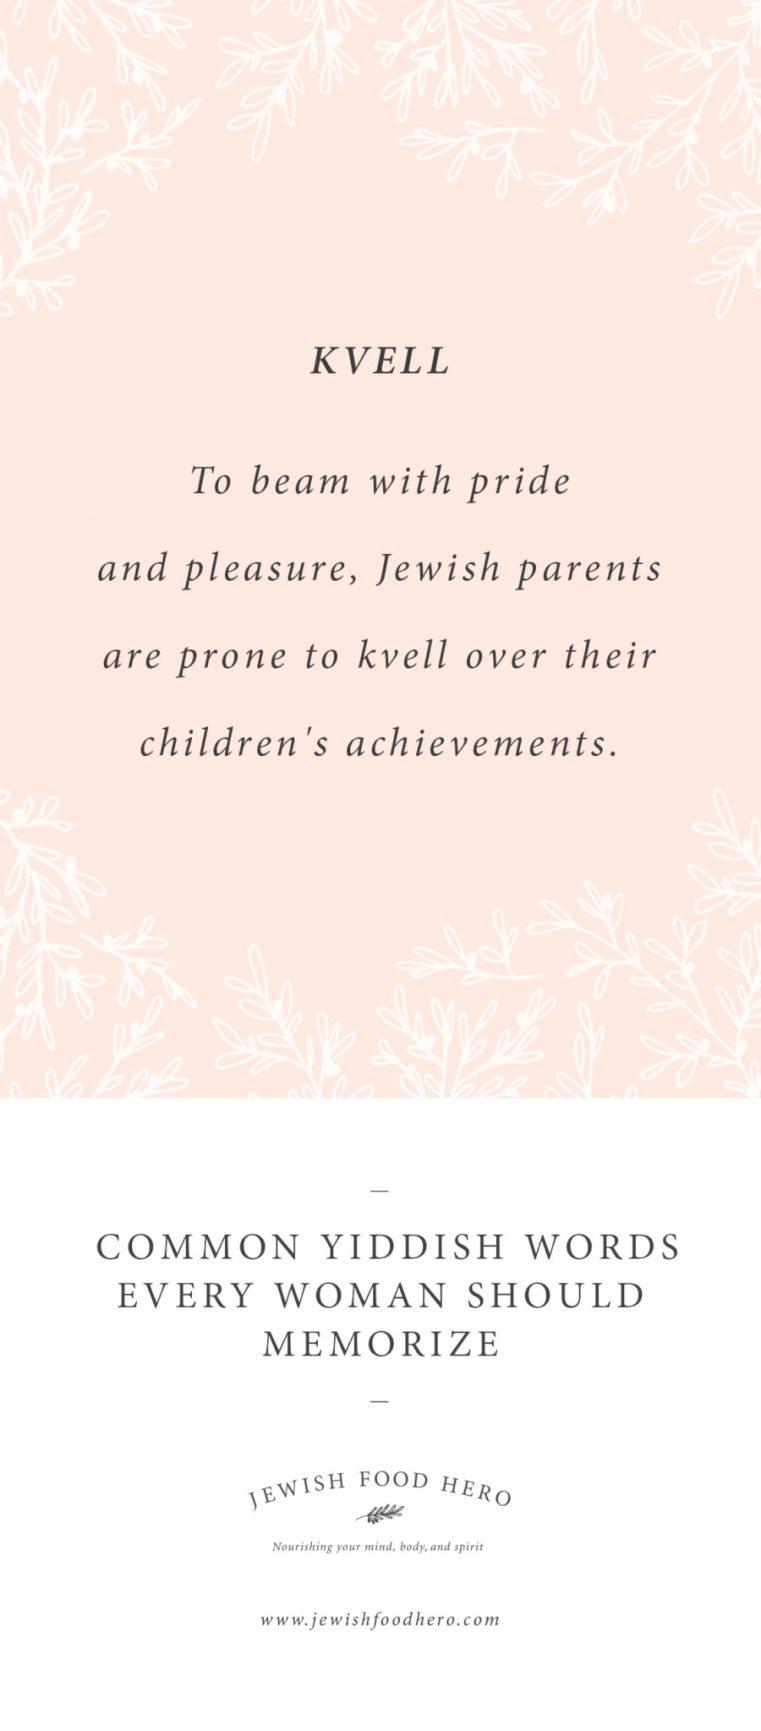 Kvell, Yiddish Words